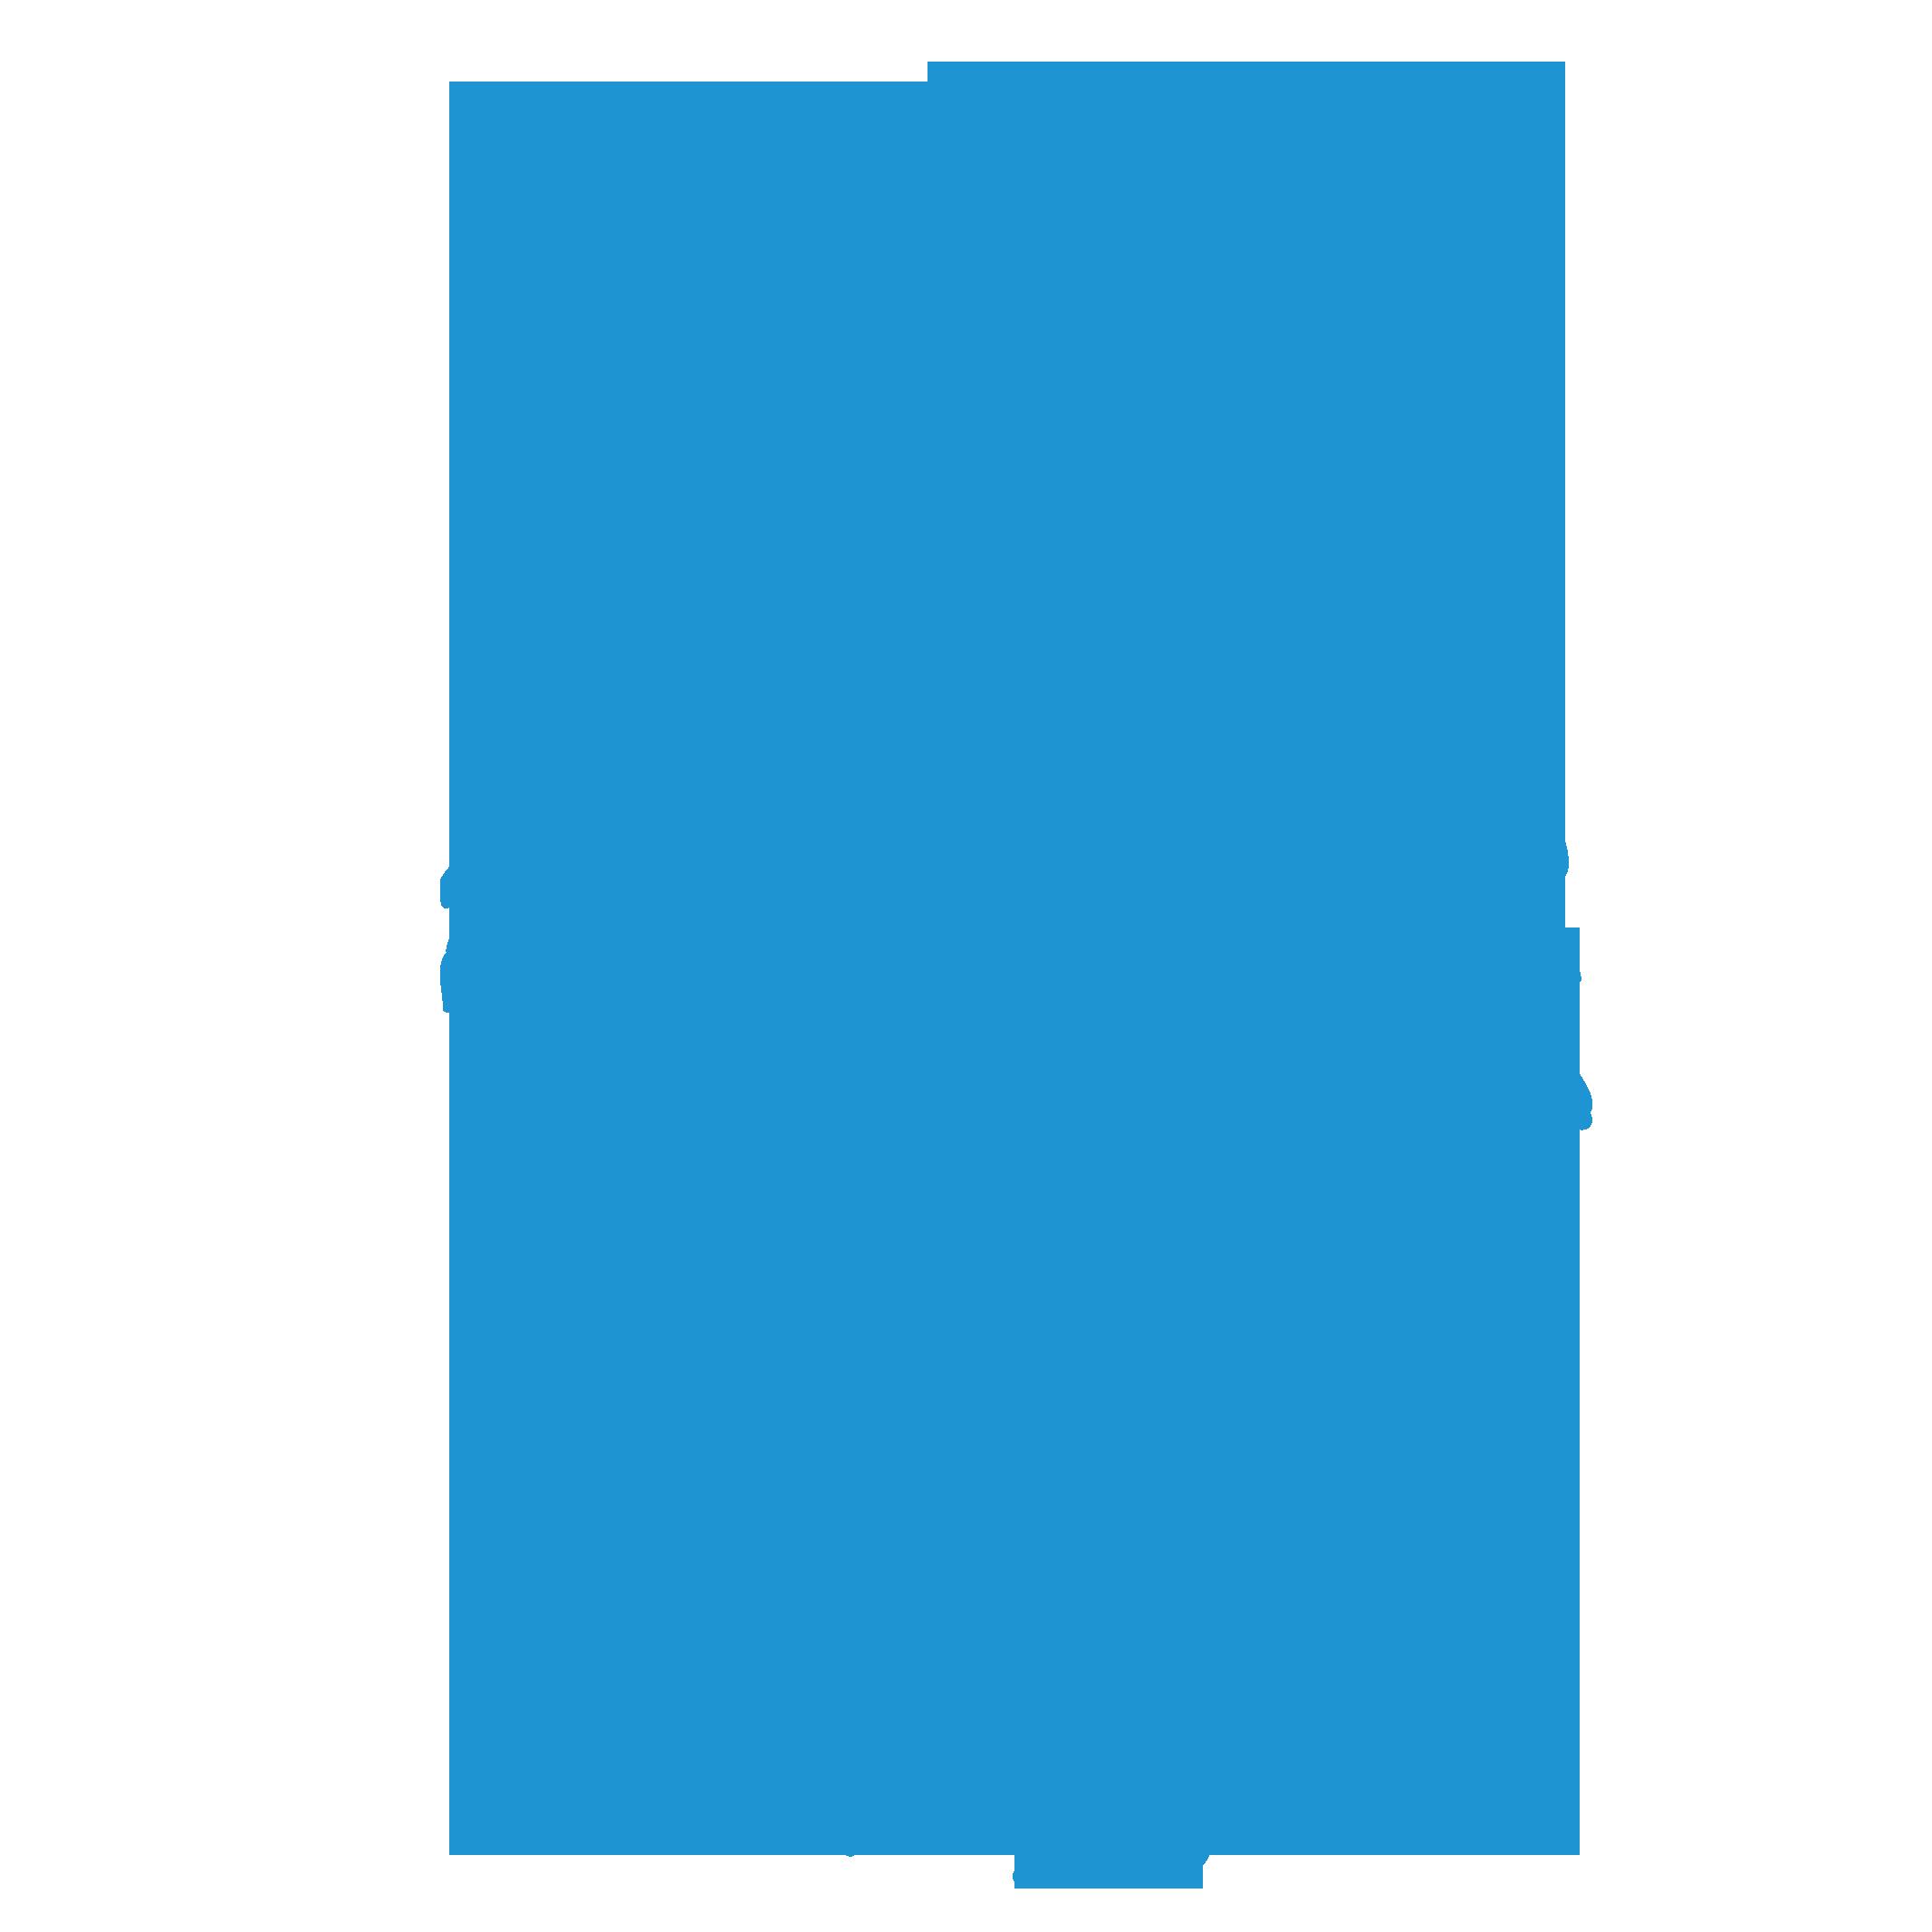 Biometrics wiegand interface electronic. Fingerprint clipart finger scanner